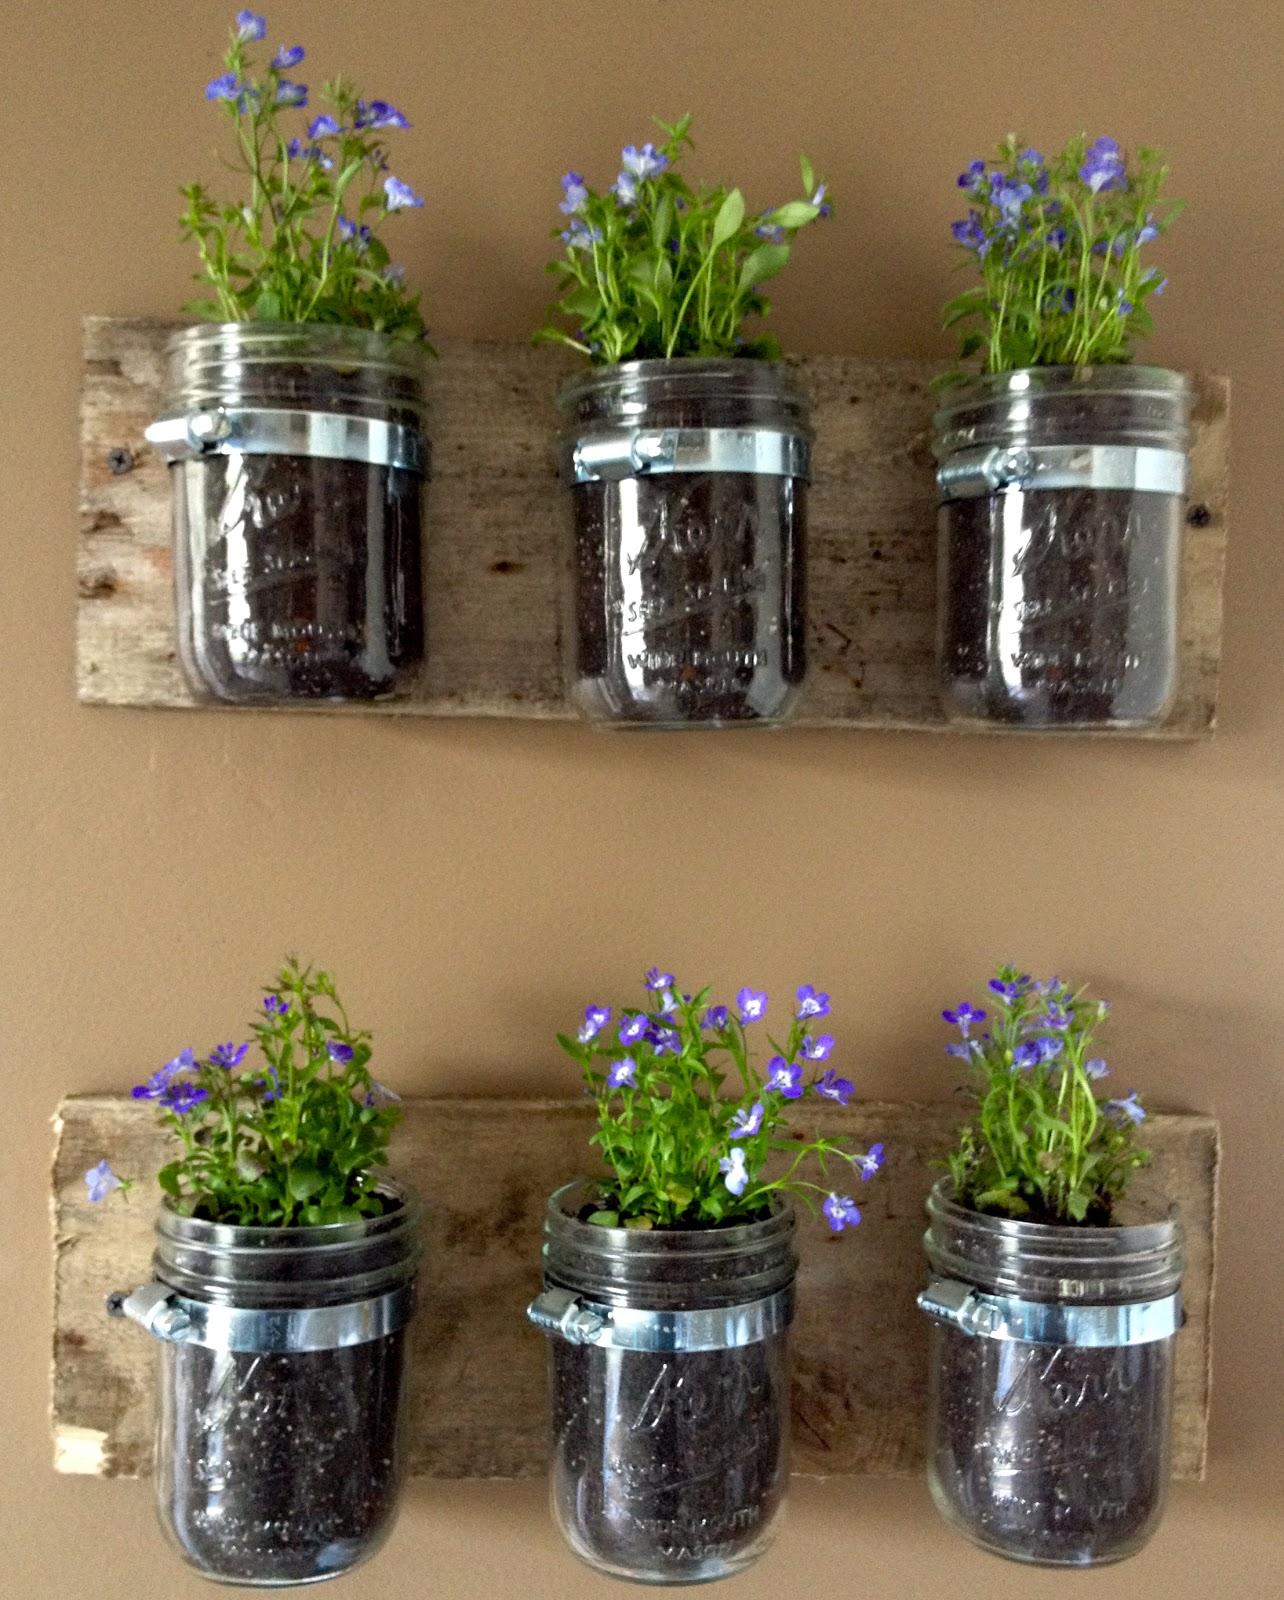 Diy Hanging Wall Planters From Mason Jars Kasey Trenum